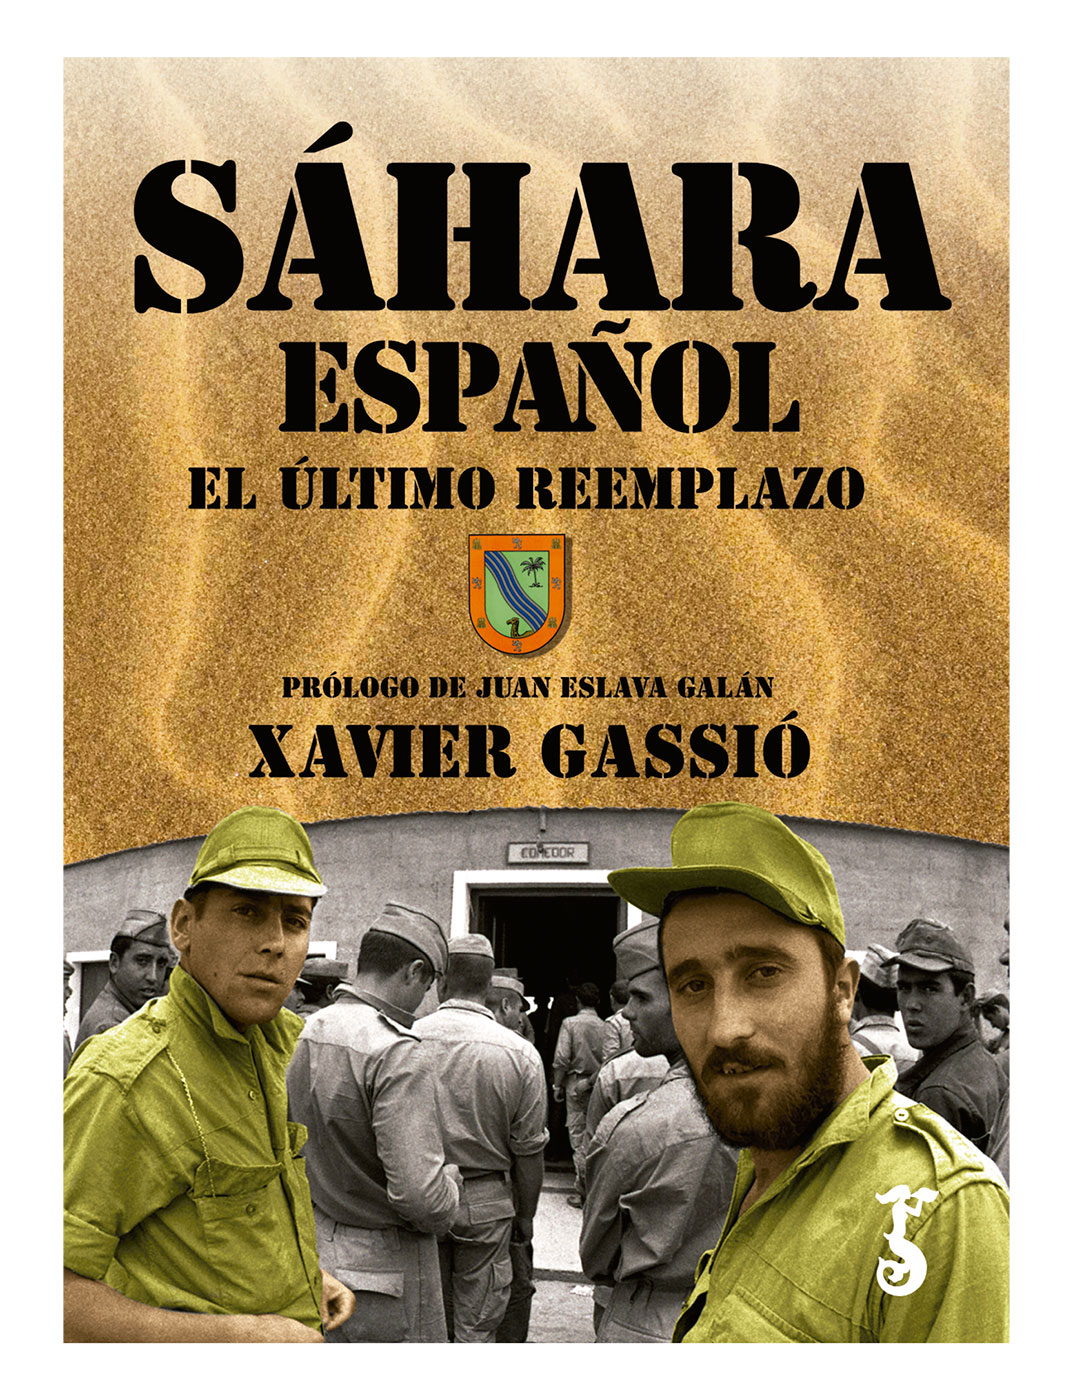 Sahara-Espanol-ultimo-reemplazo-xavier-gassio-ediciones-arzalia